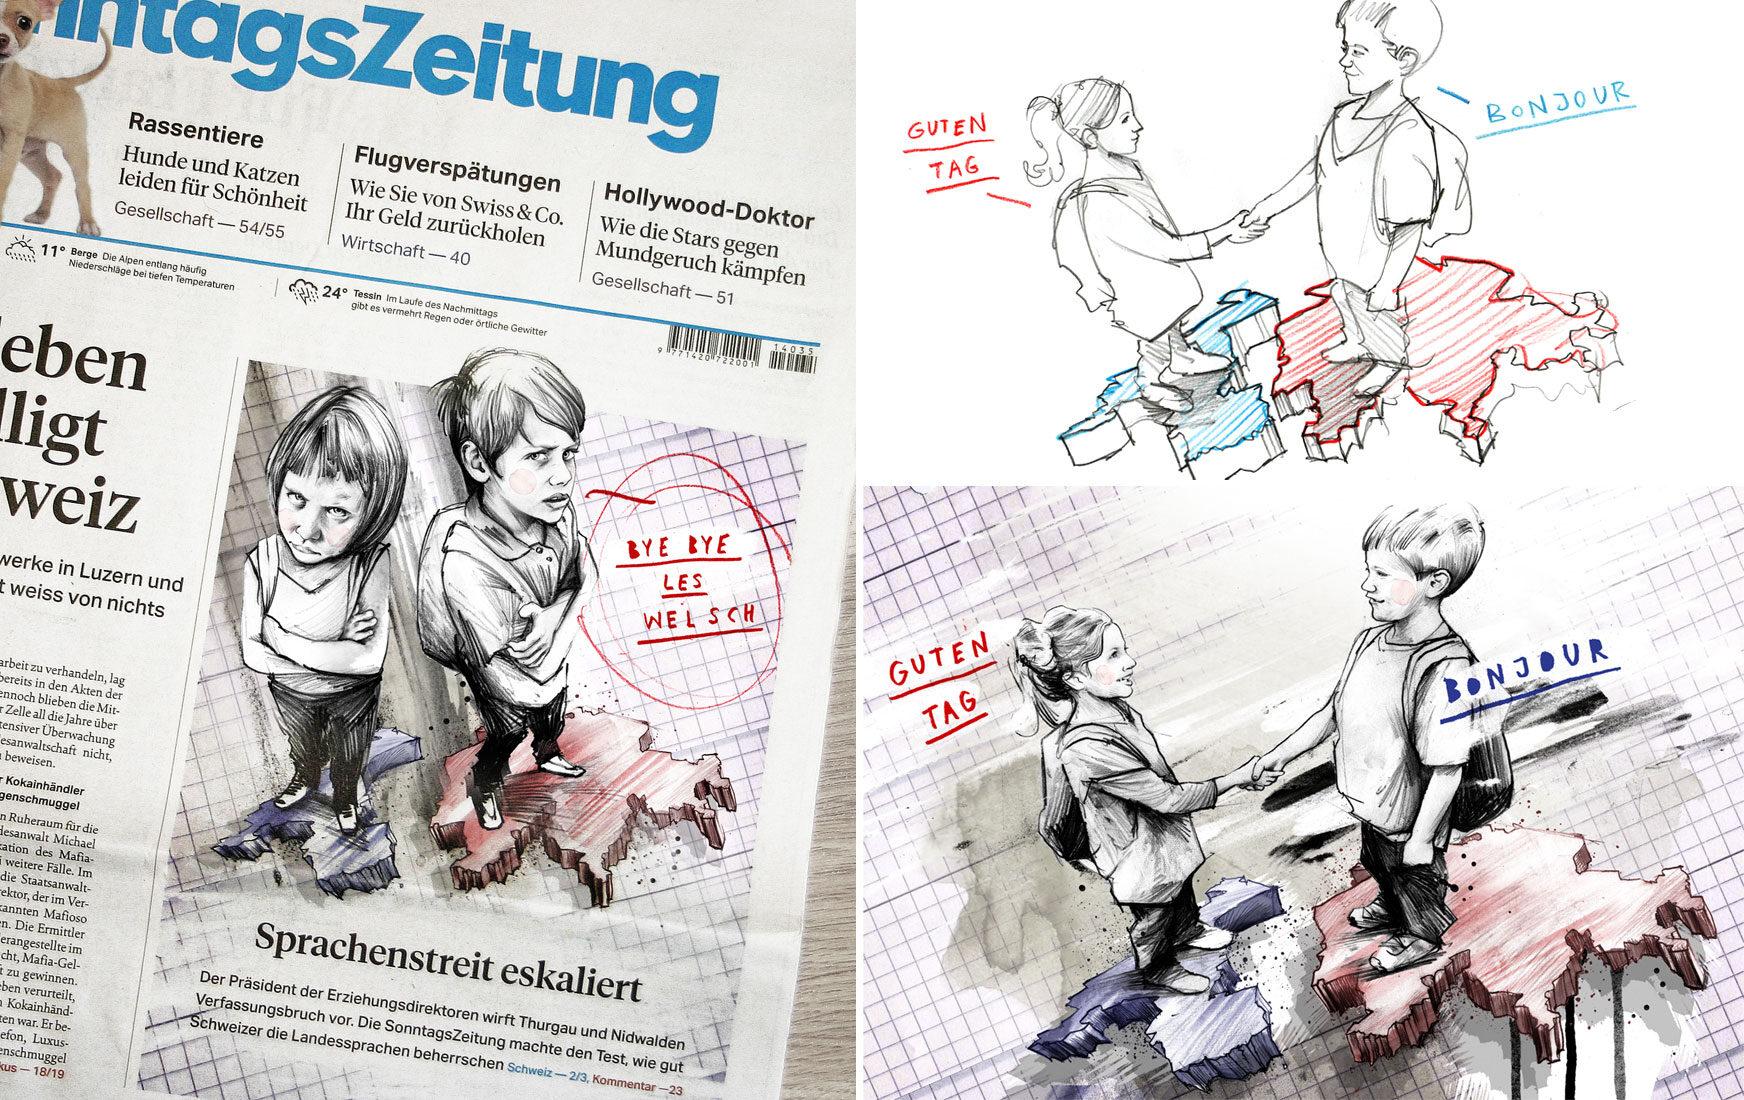 Sonntagszeitung - Kornel Illustration | Kornel Stadler portfolio